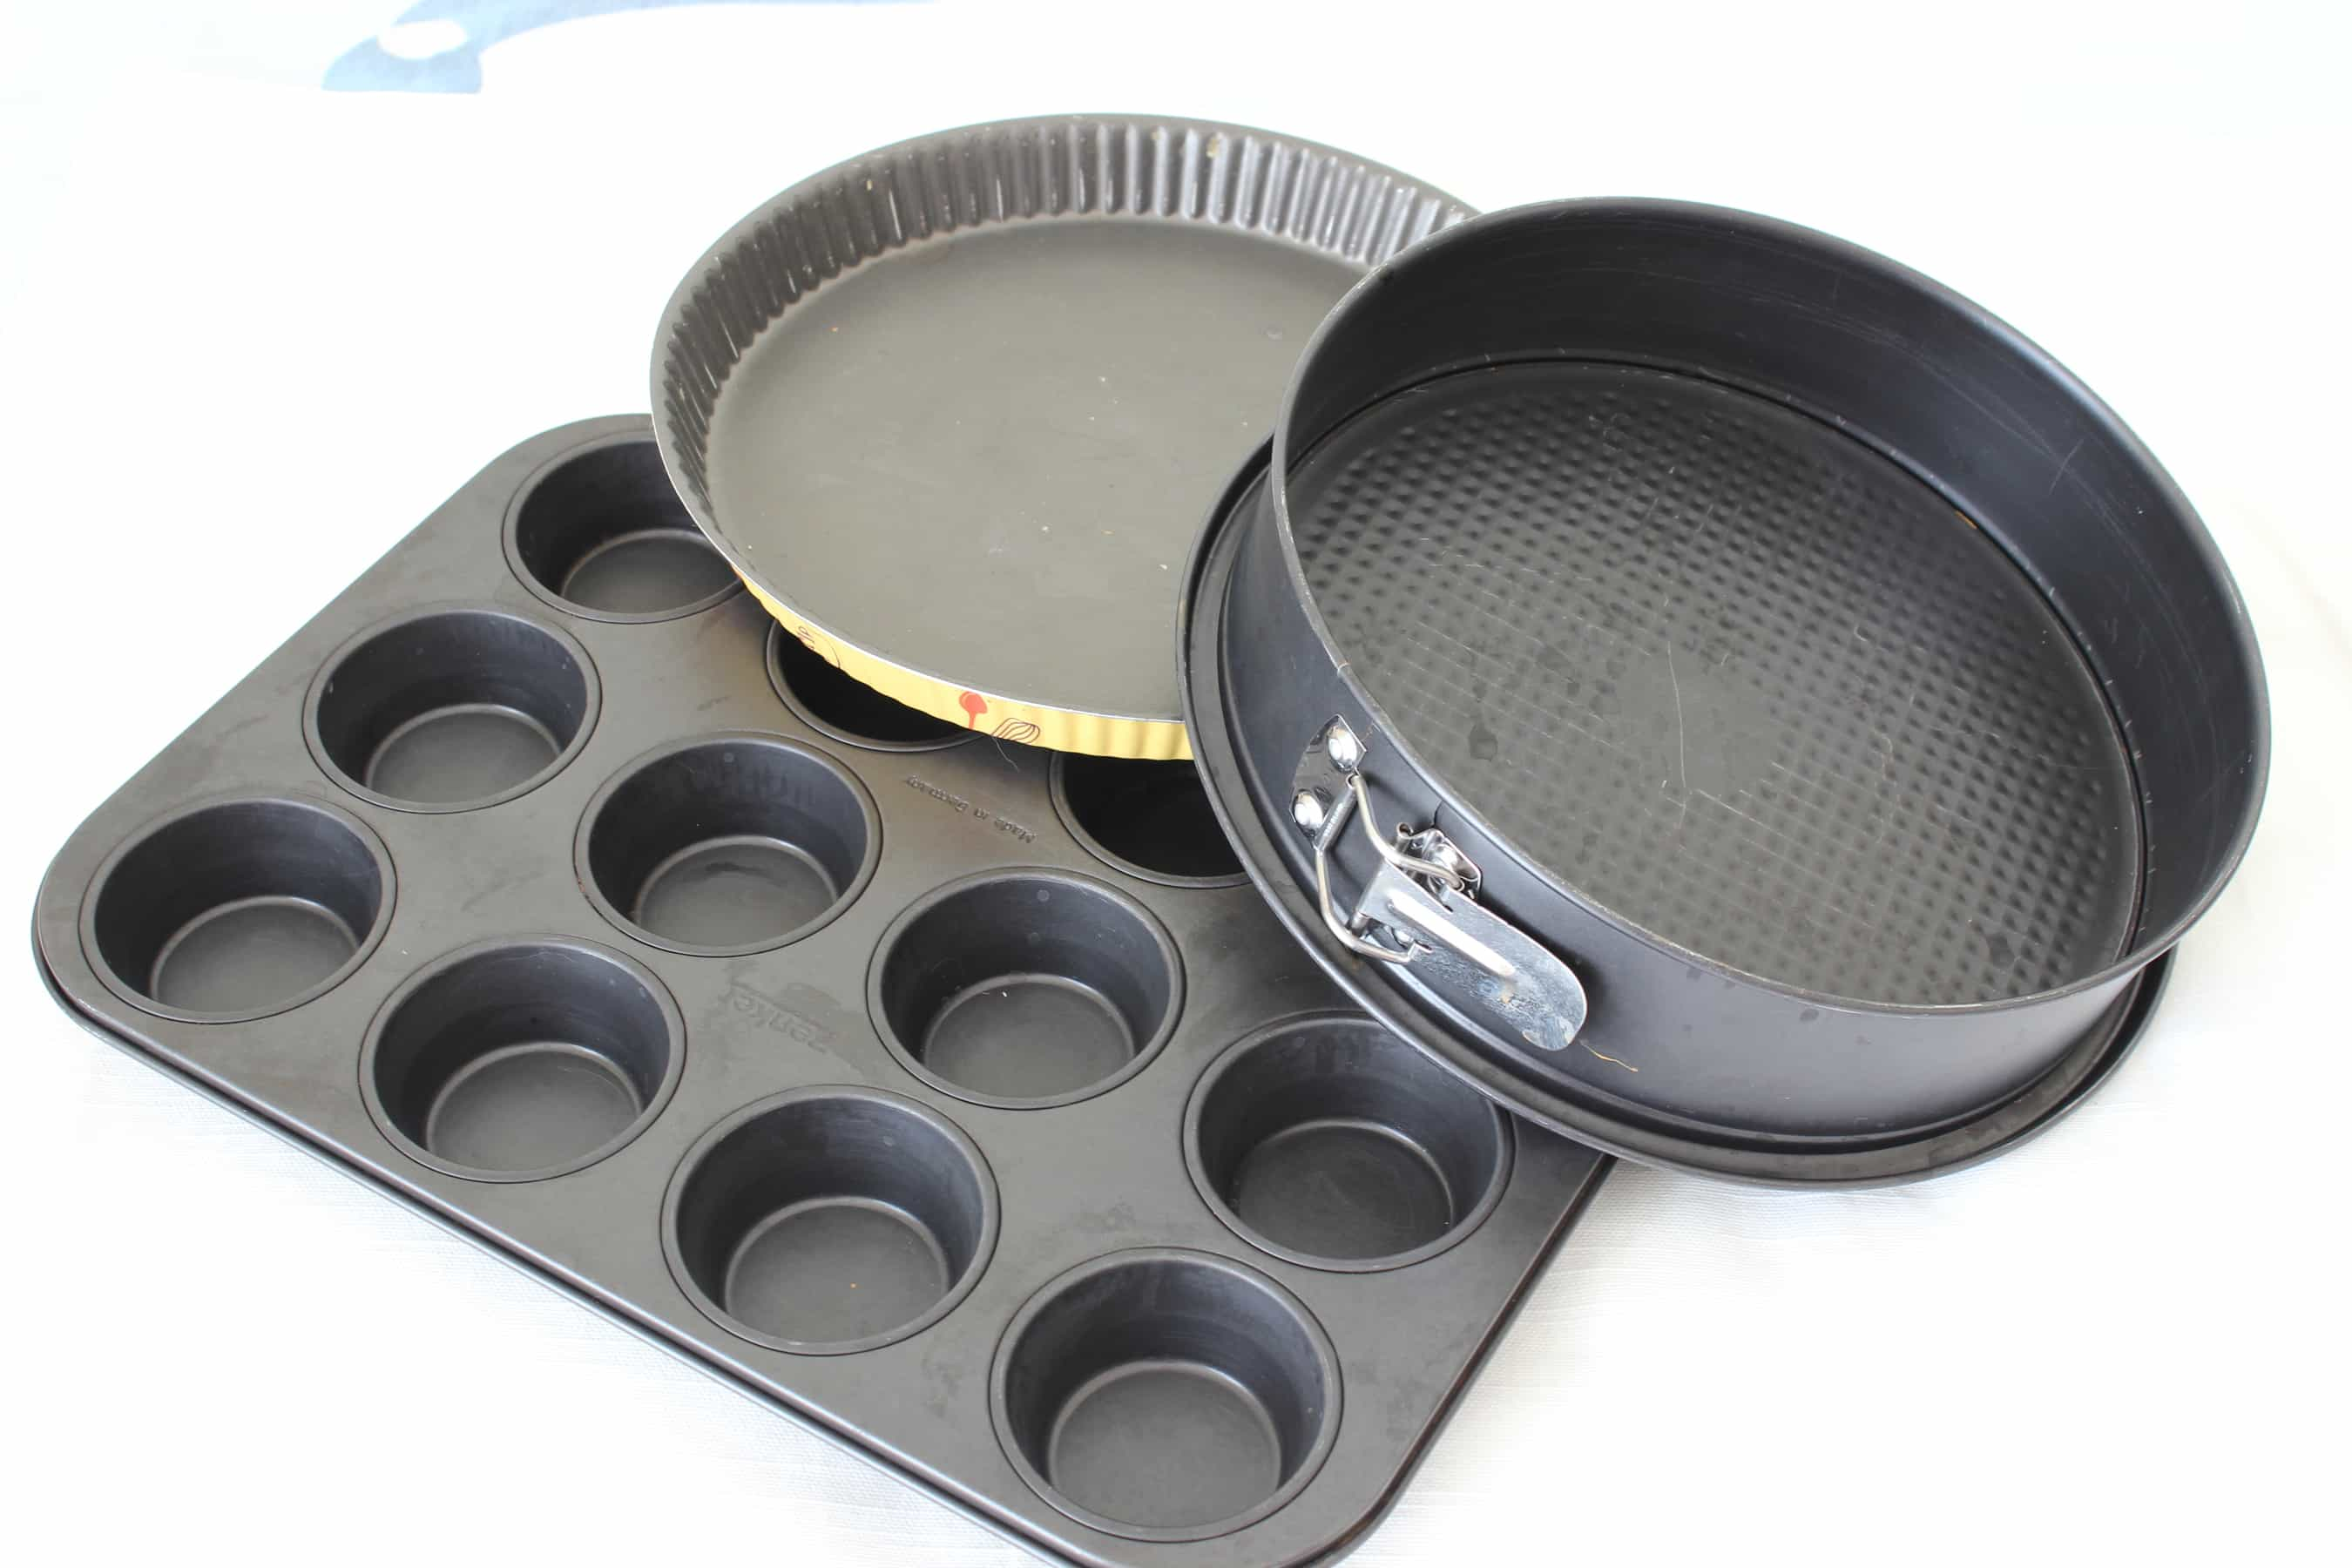 Gli indispensabili in cucina - pasticceria - WoMoms®